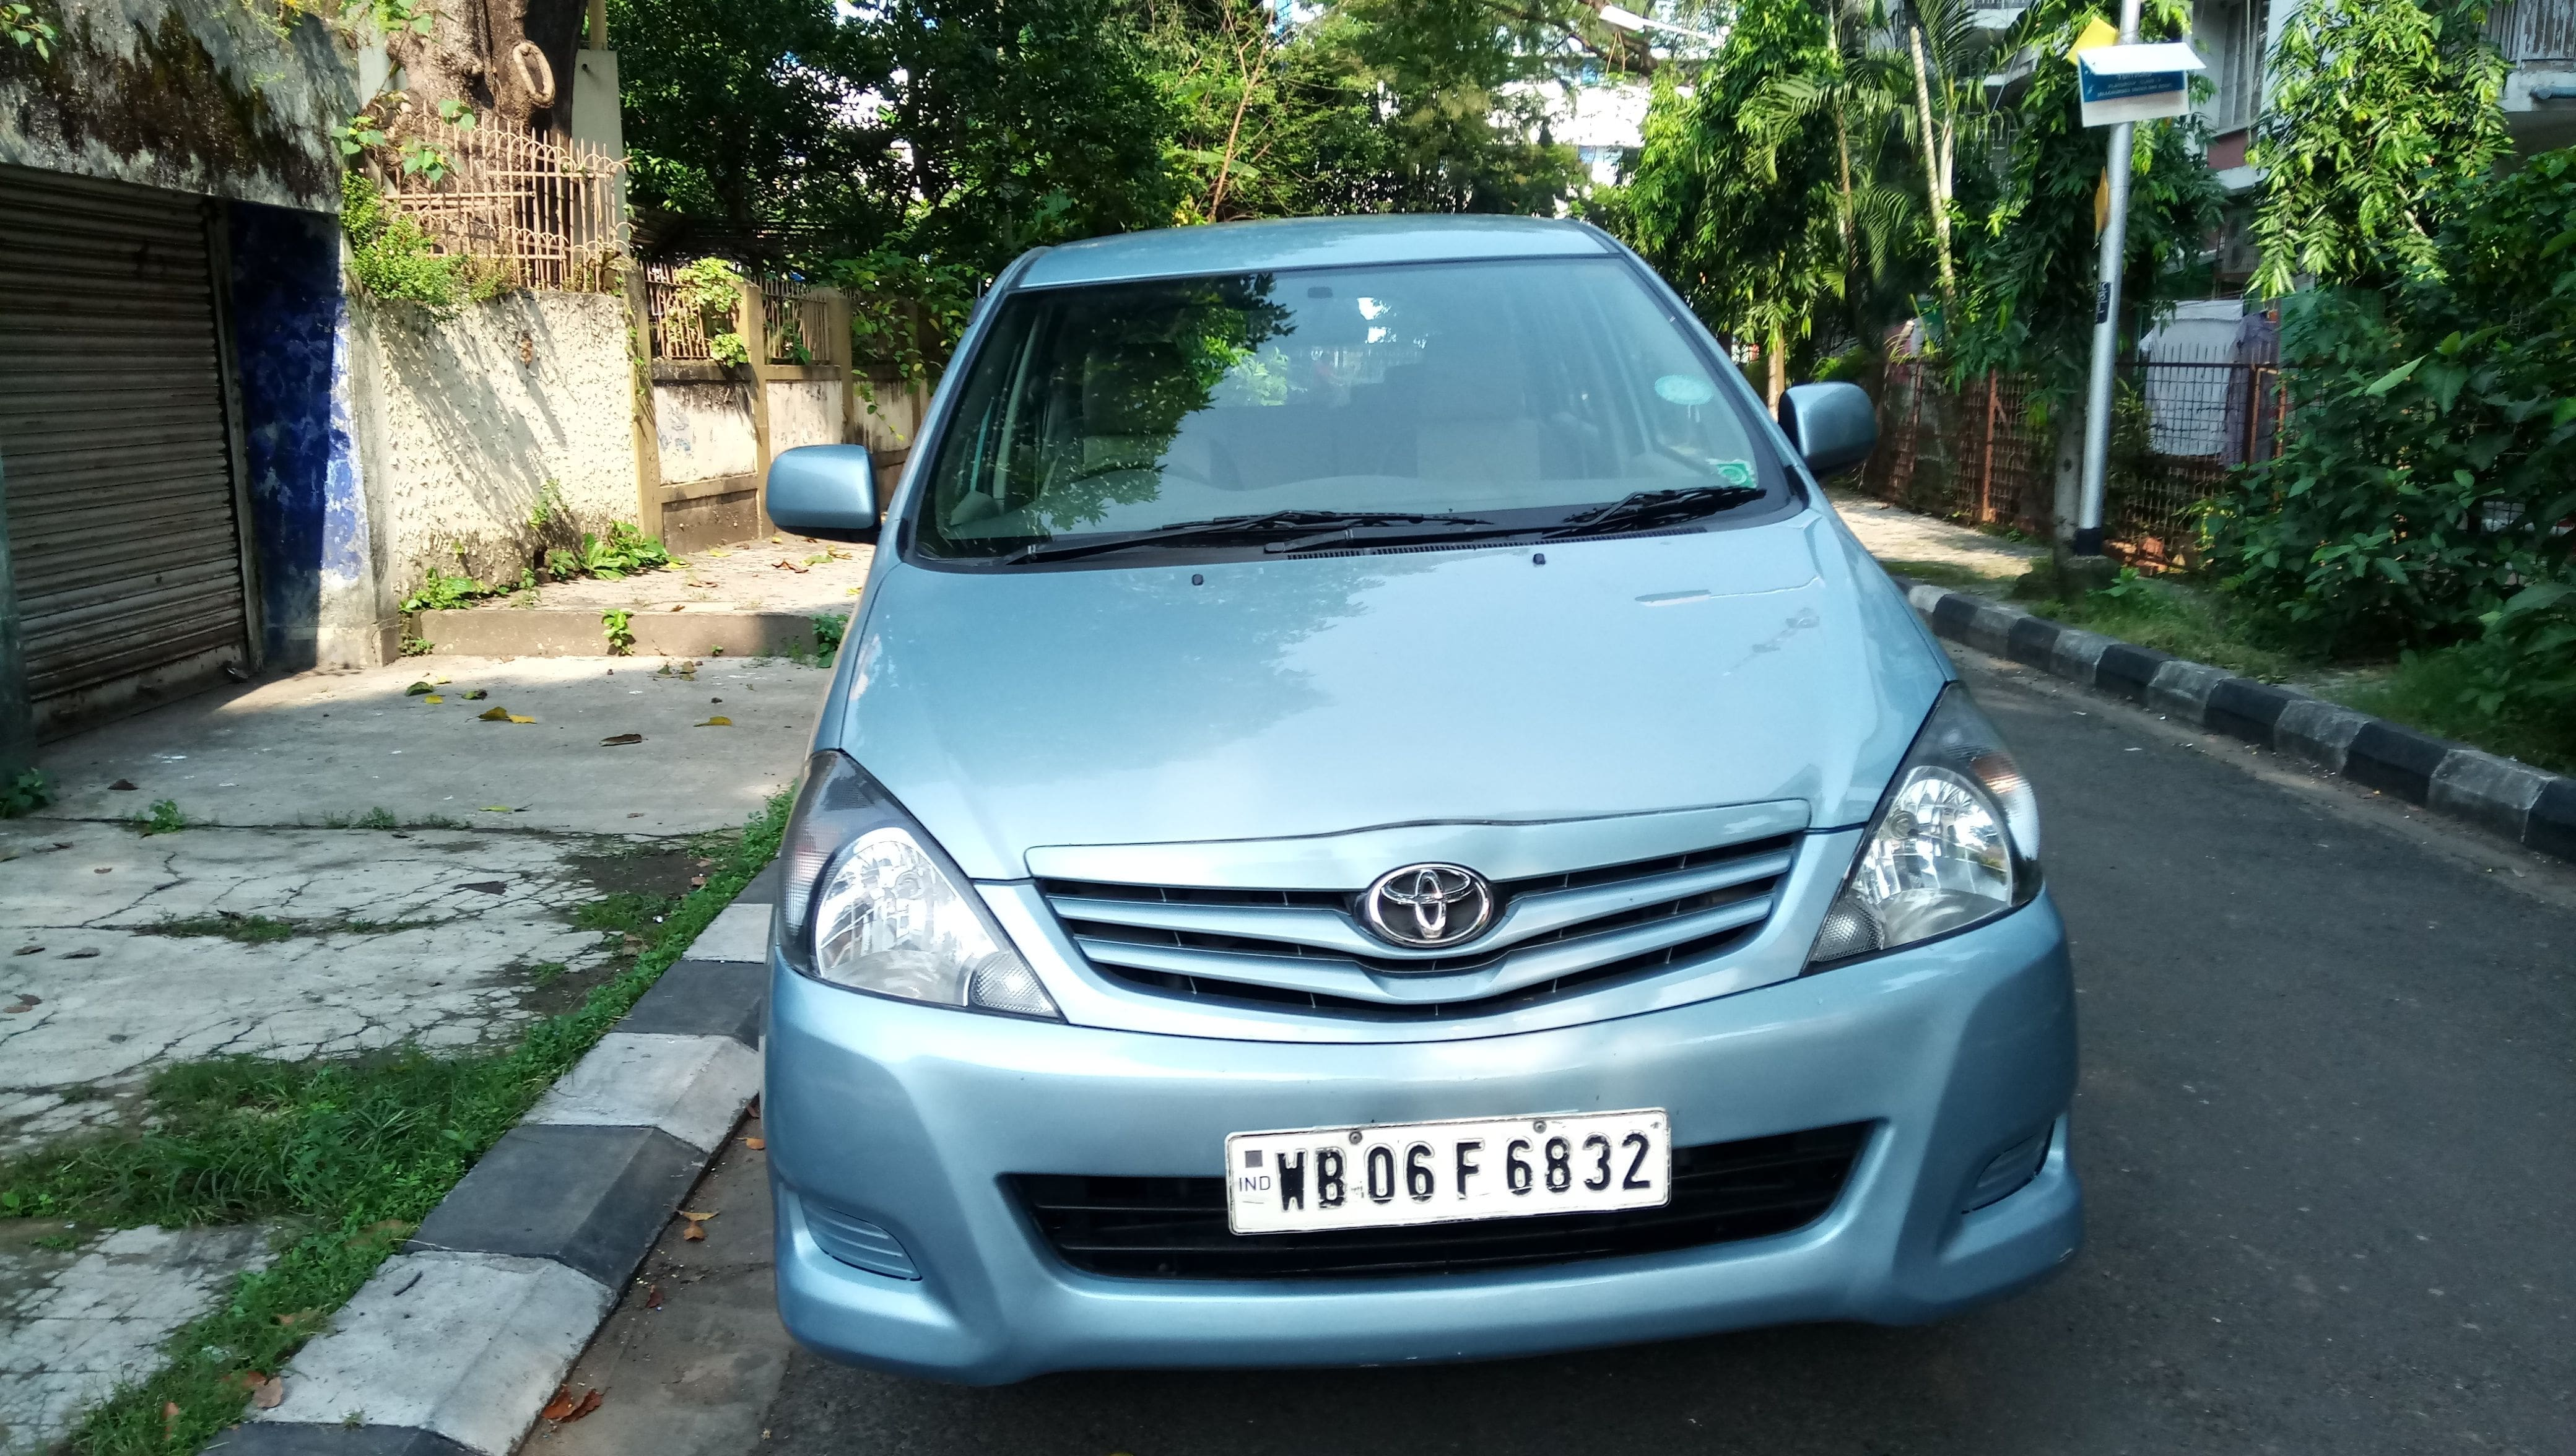 Toyota Innova 2004-2011 2.5 GX (Diesel) 8 Seater BS IV